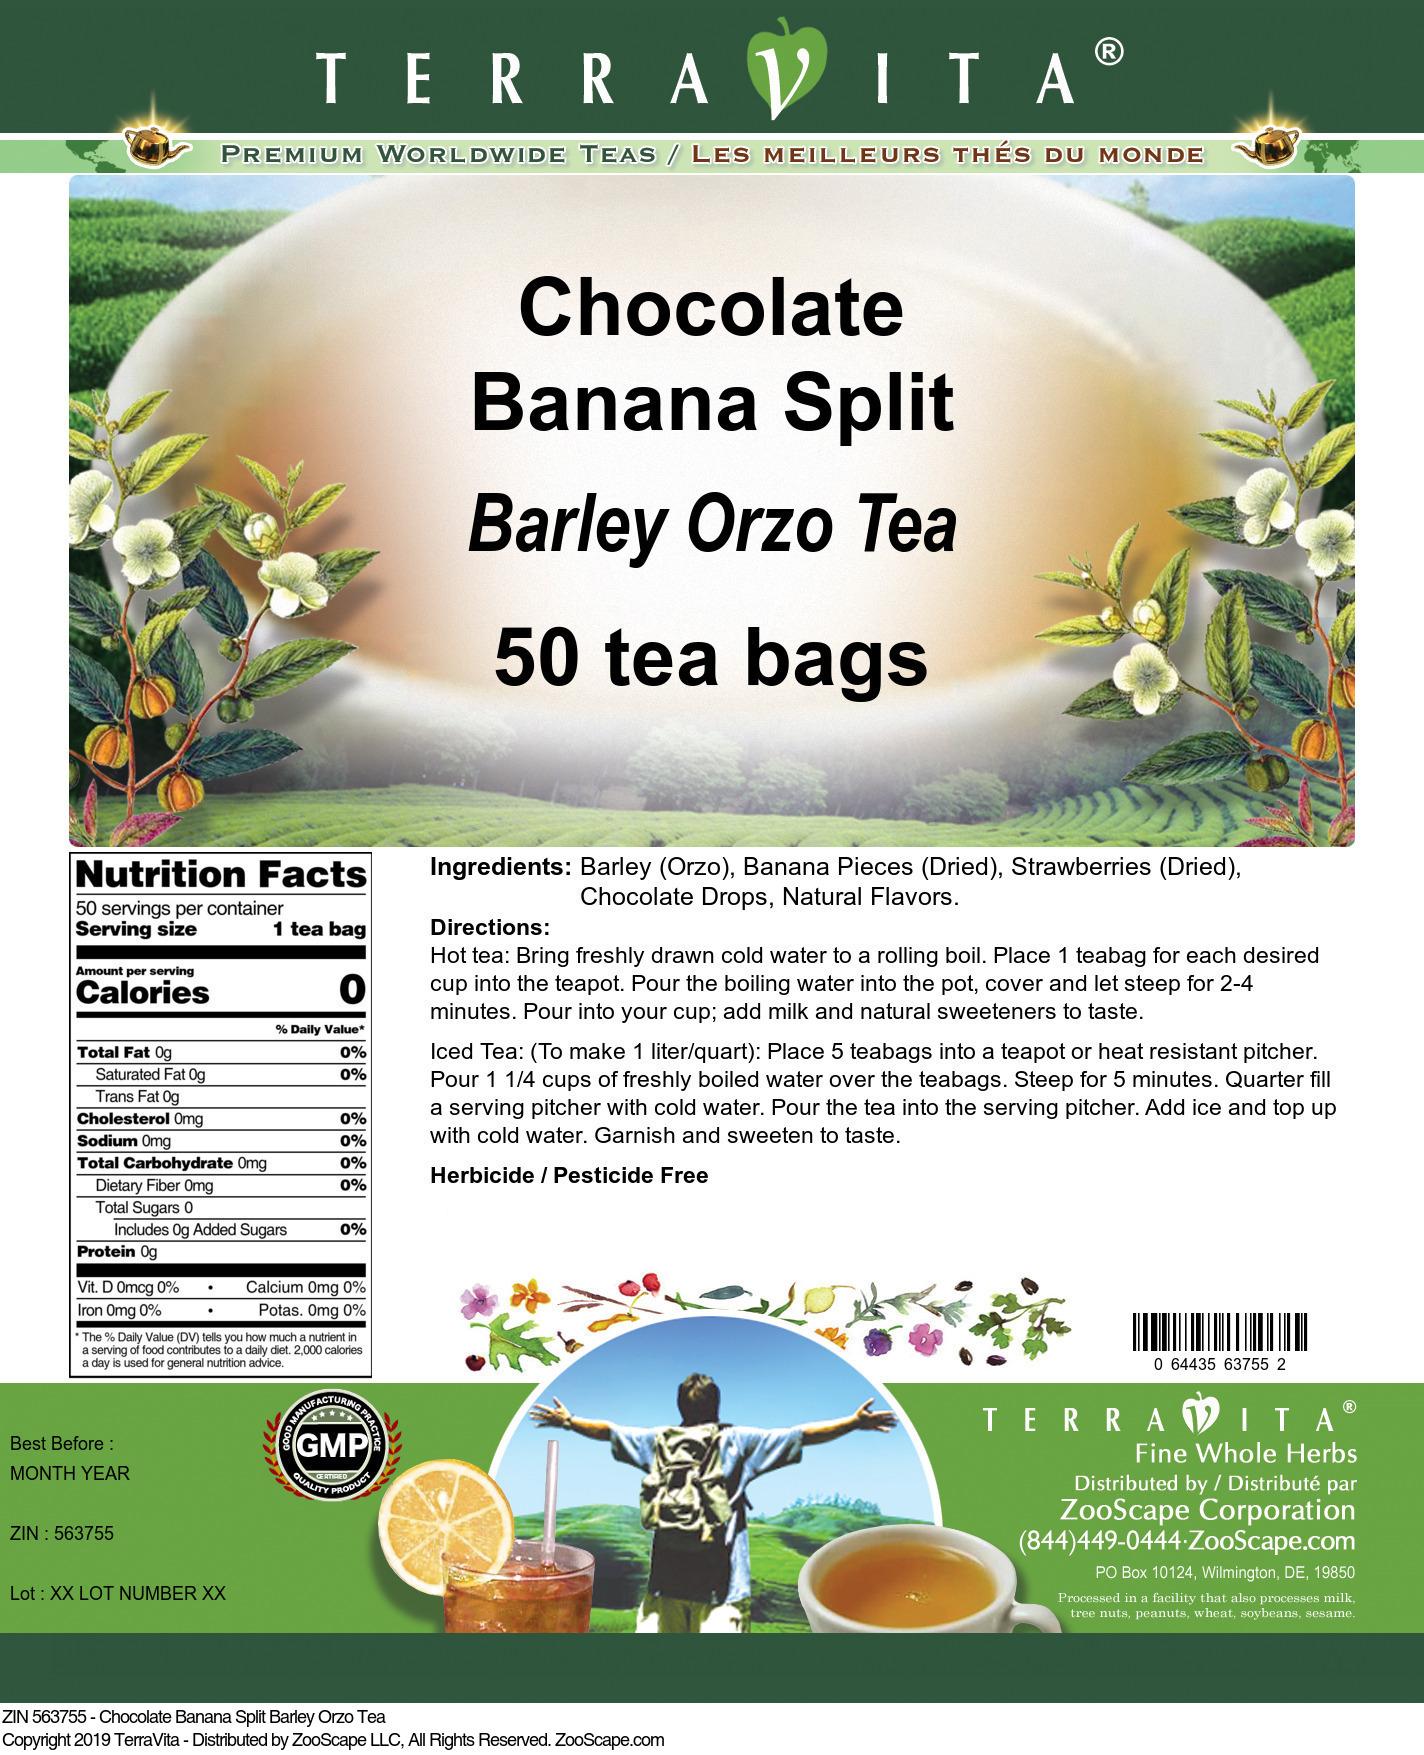 Chocolate Banana Split Barley Orzo Tea